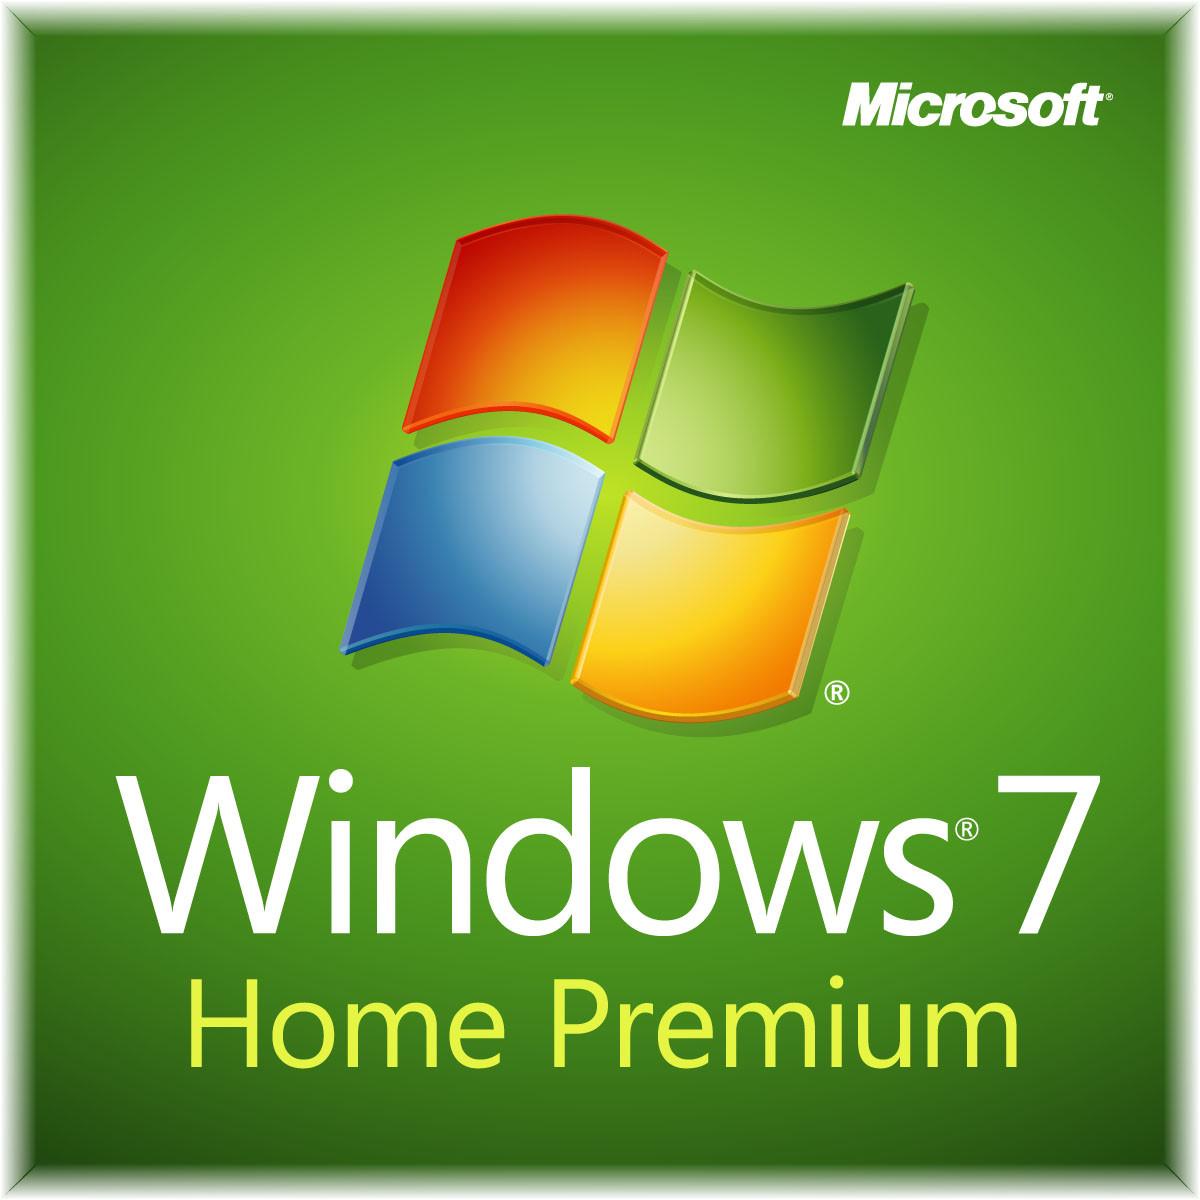 Microsoft Windows 7 Home Premium SP1 32-bit EN, OEM (GFC-02021)